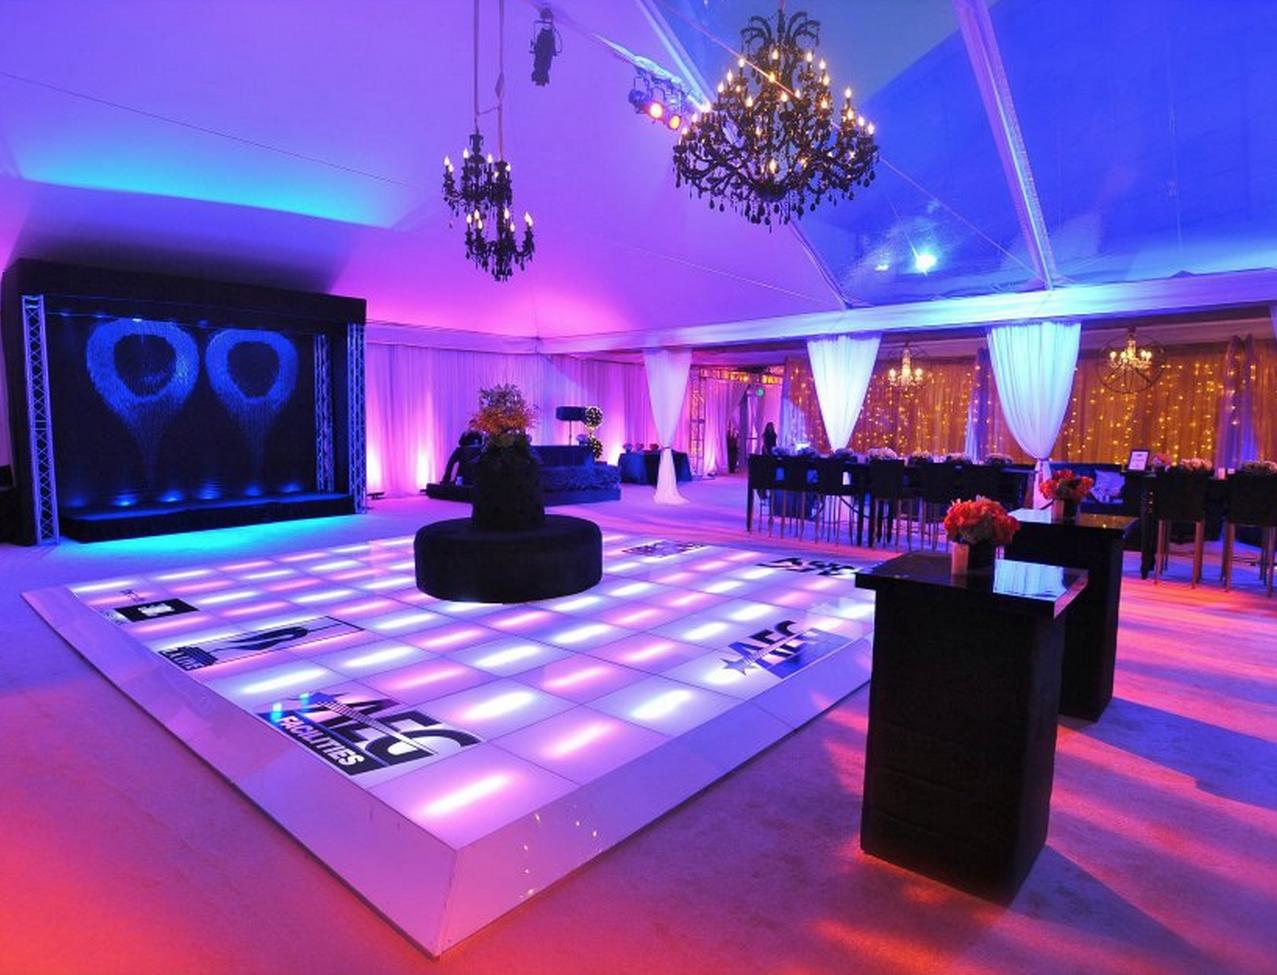 Portable Lighted Dance Floor : Dance floors for weddings portable